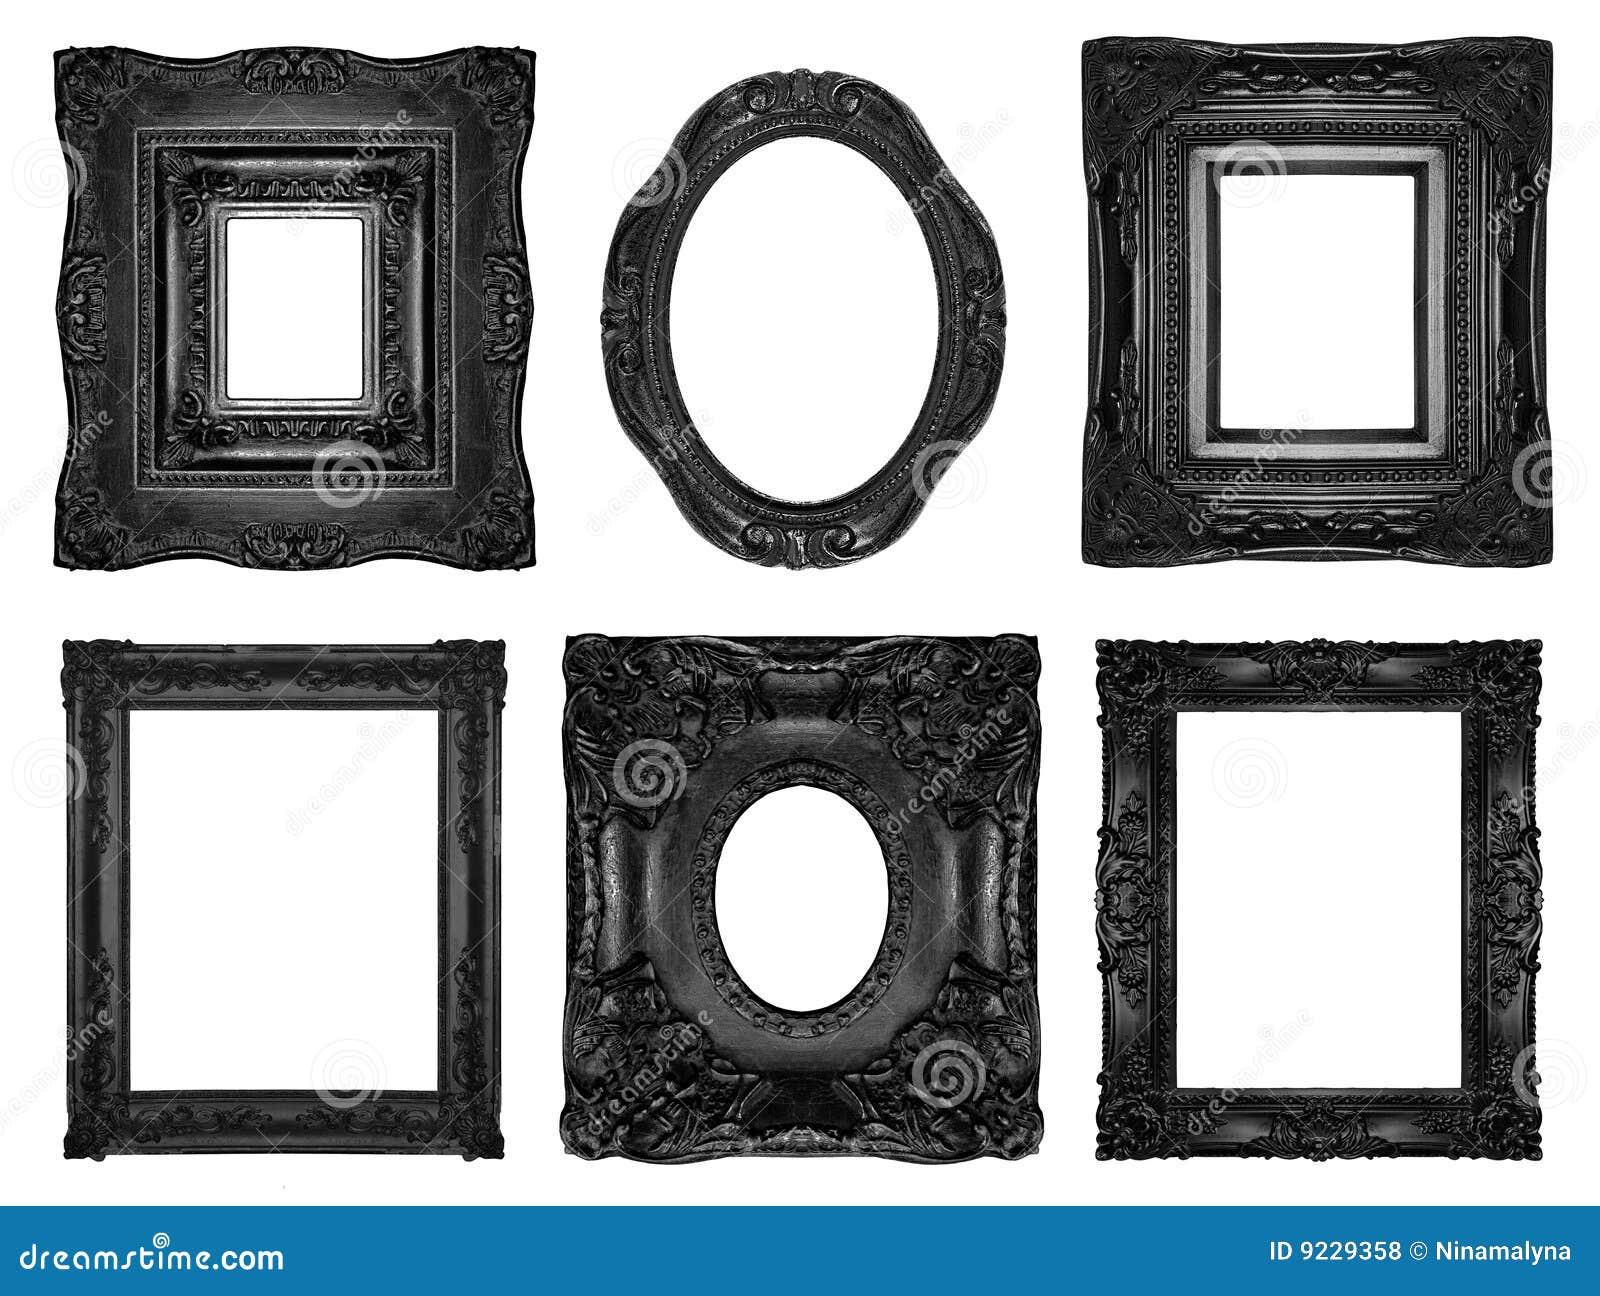 Beautiful ornate frames stock photo. Image of photographic - 9229358